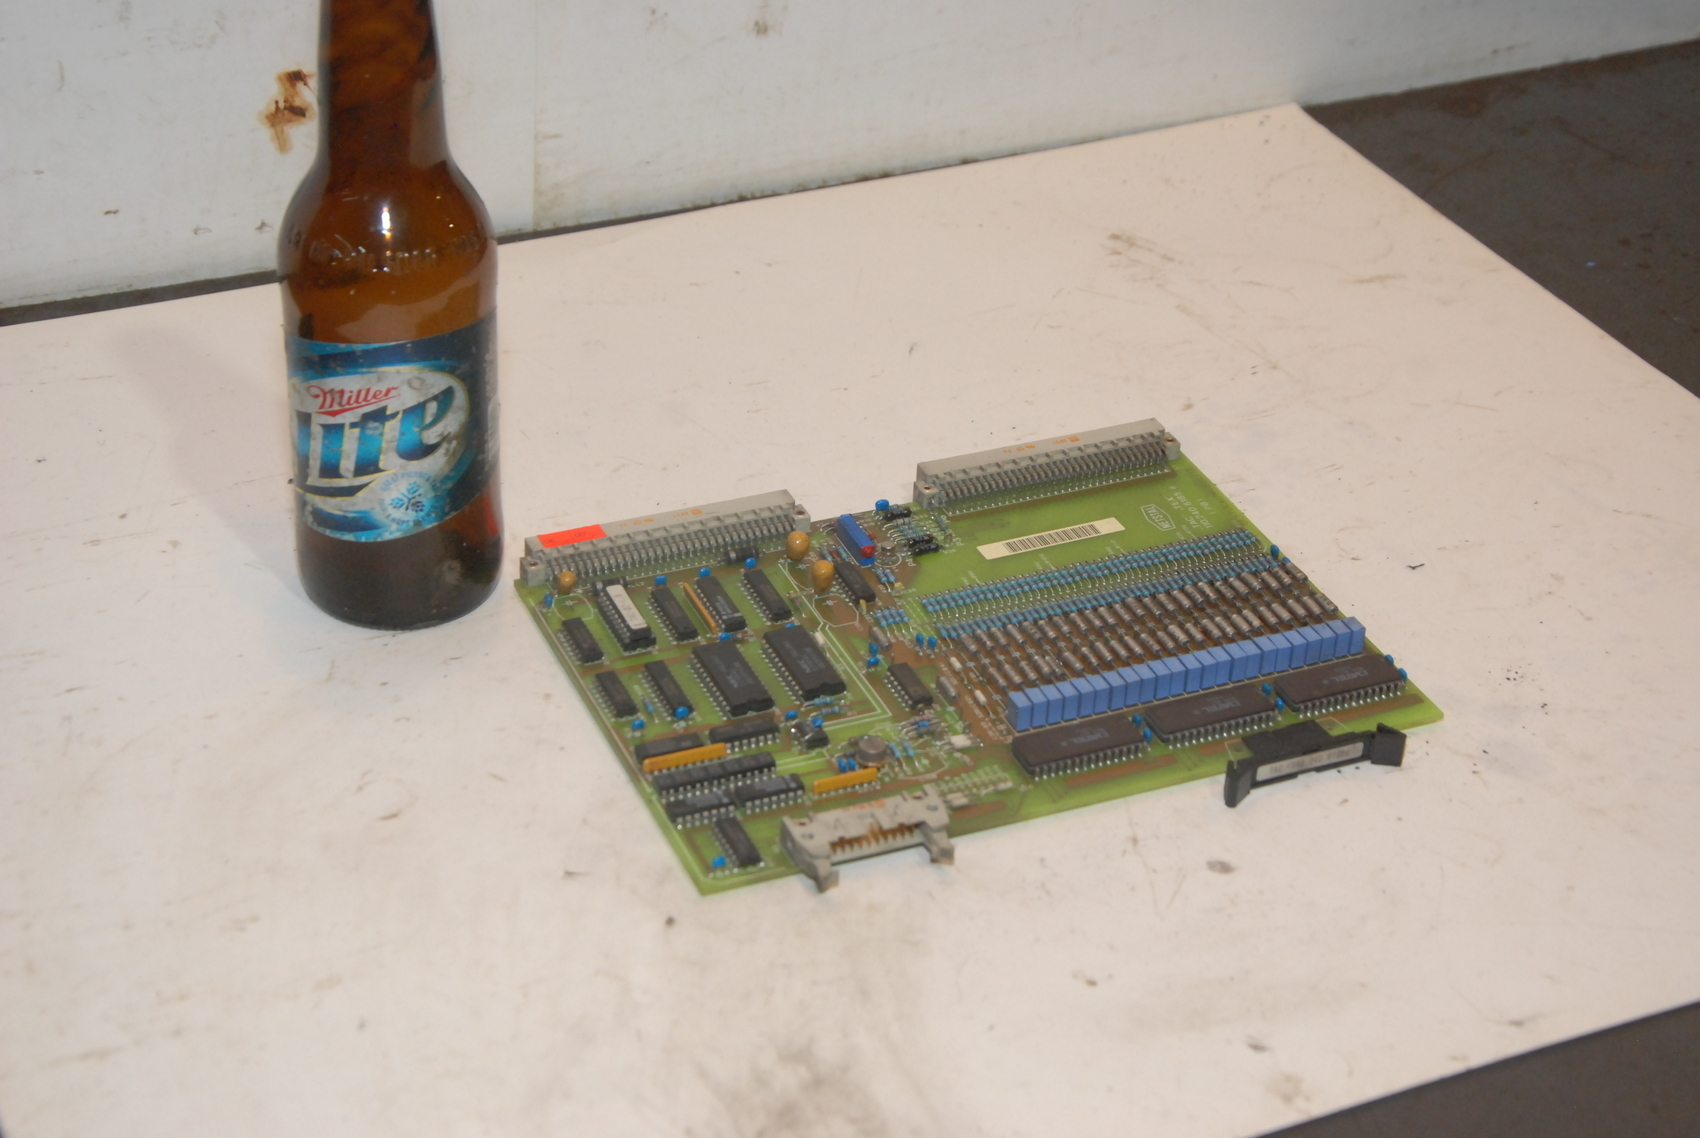 Netstal 110.240.6185a(p8)Lotseite Circuit Board